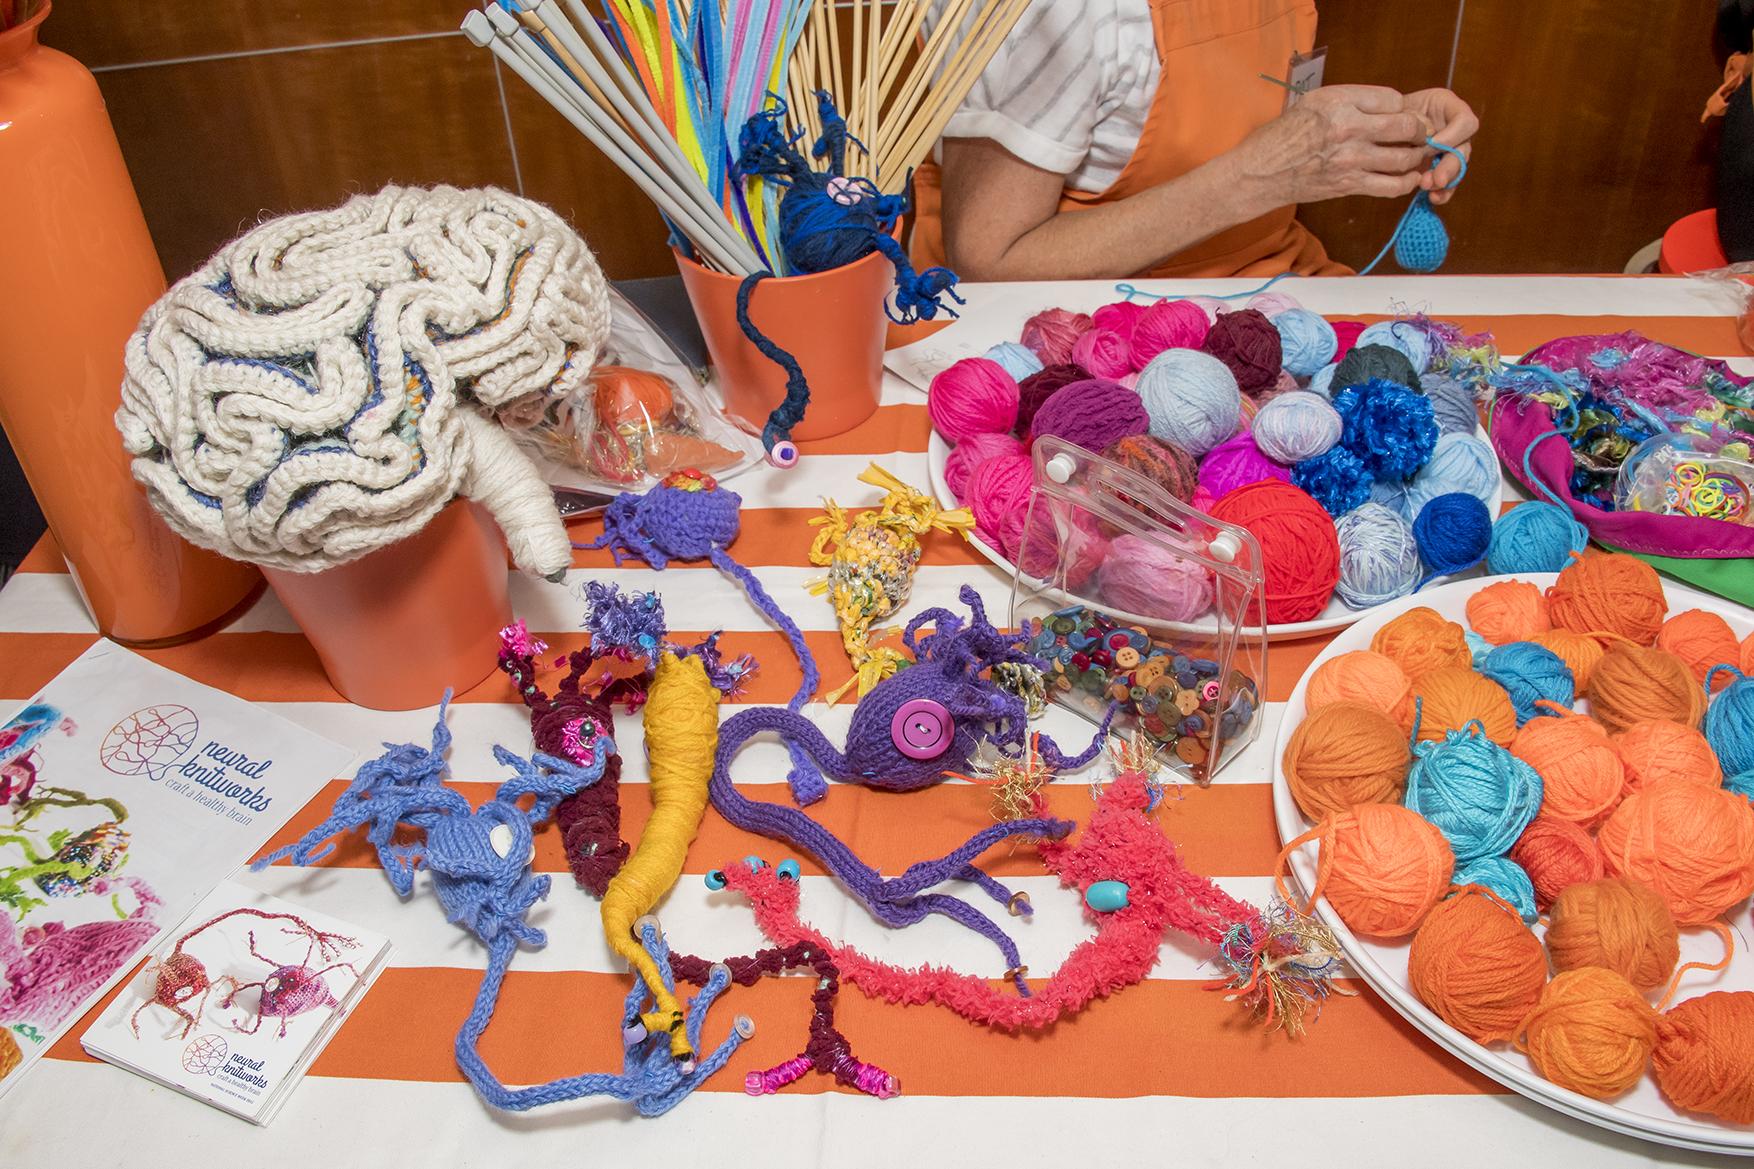 86249 March Arts Knitting Neurons-230357 copy.jpg